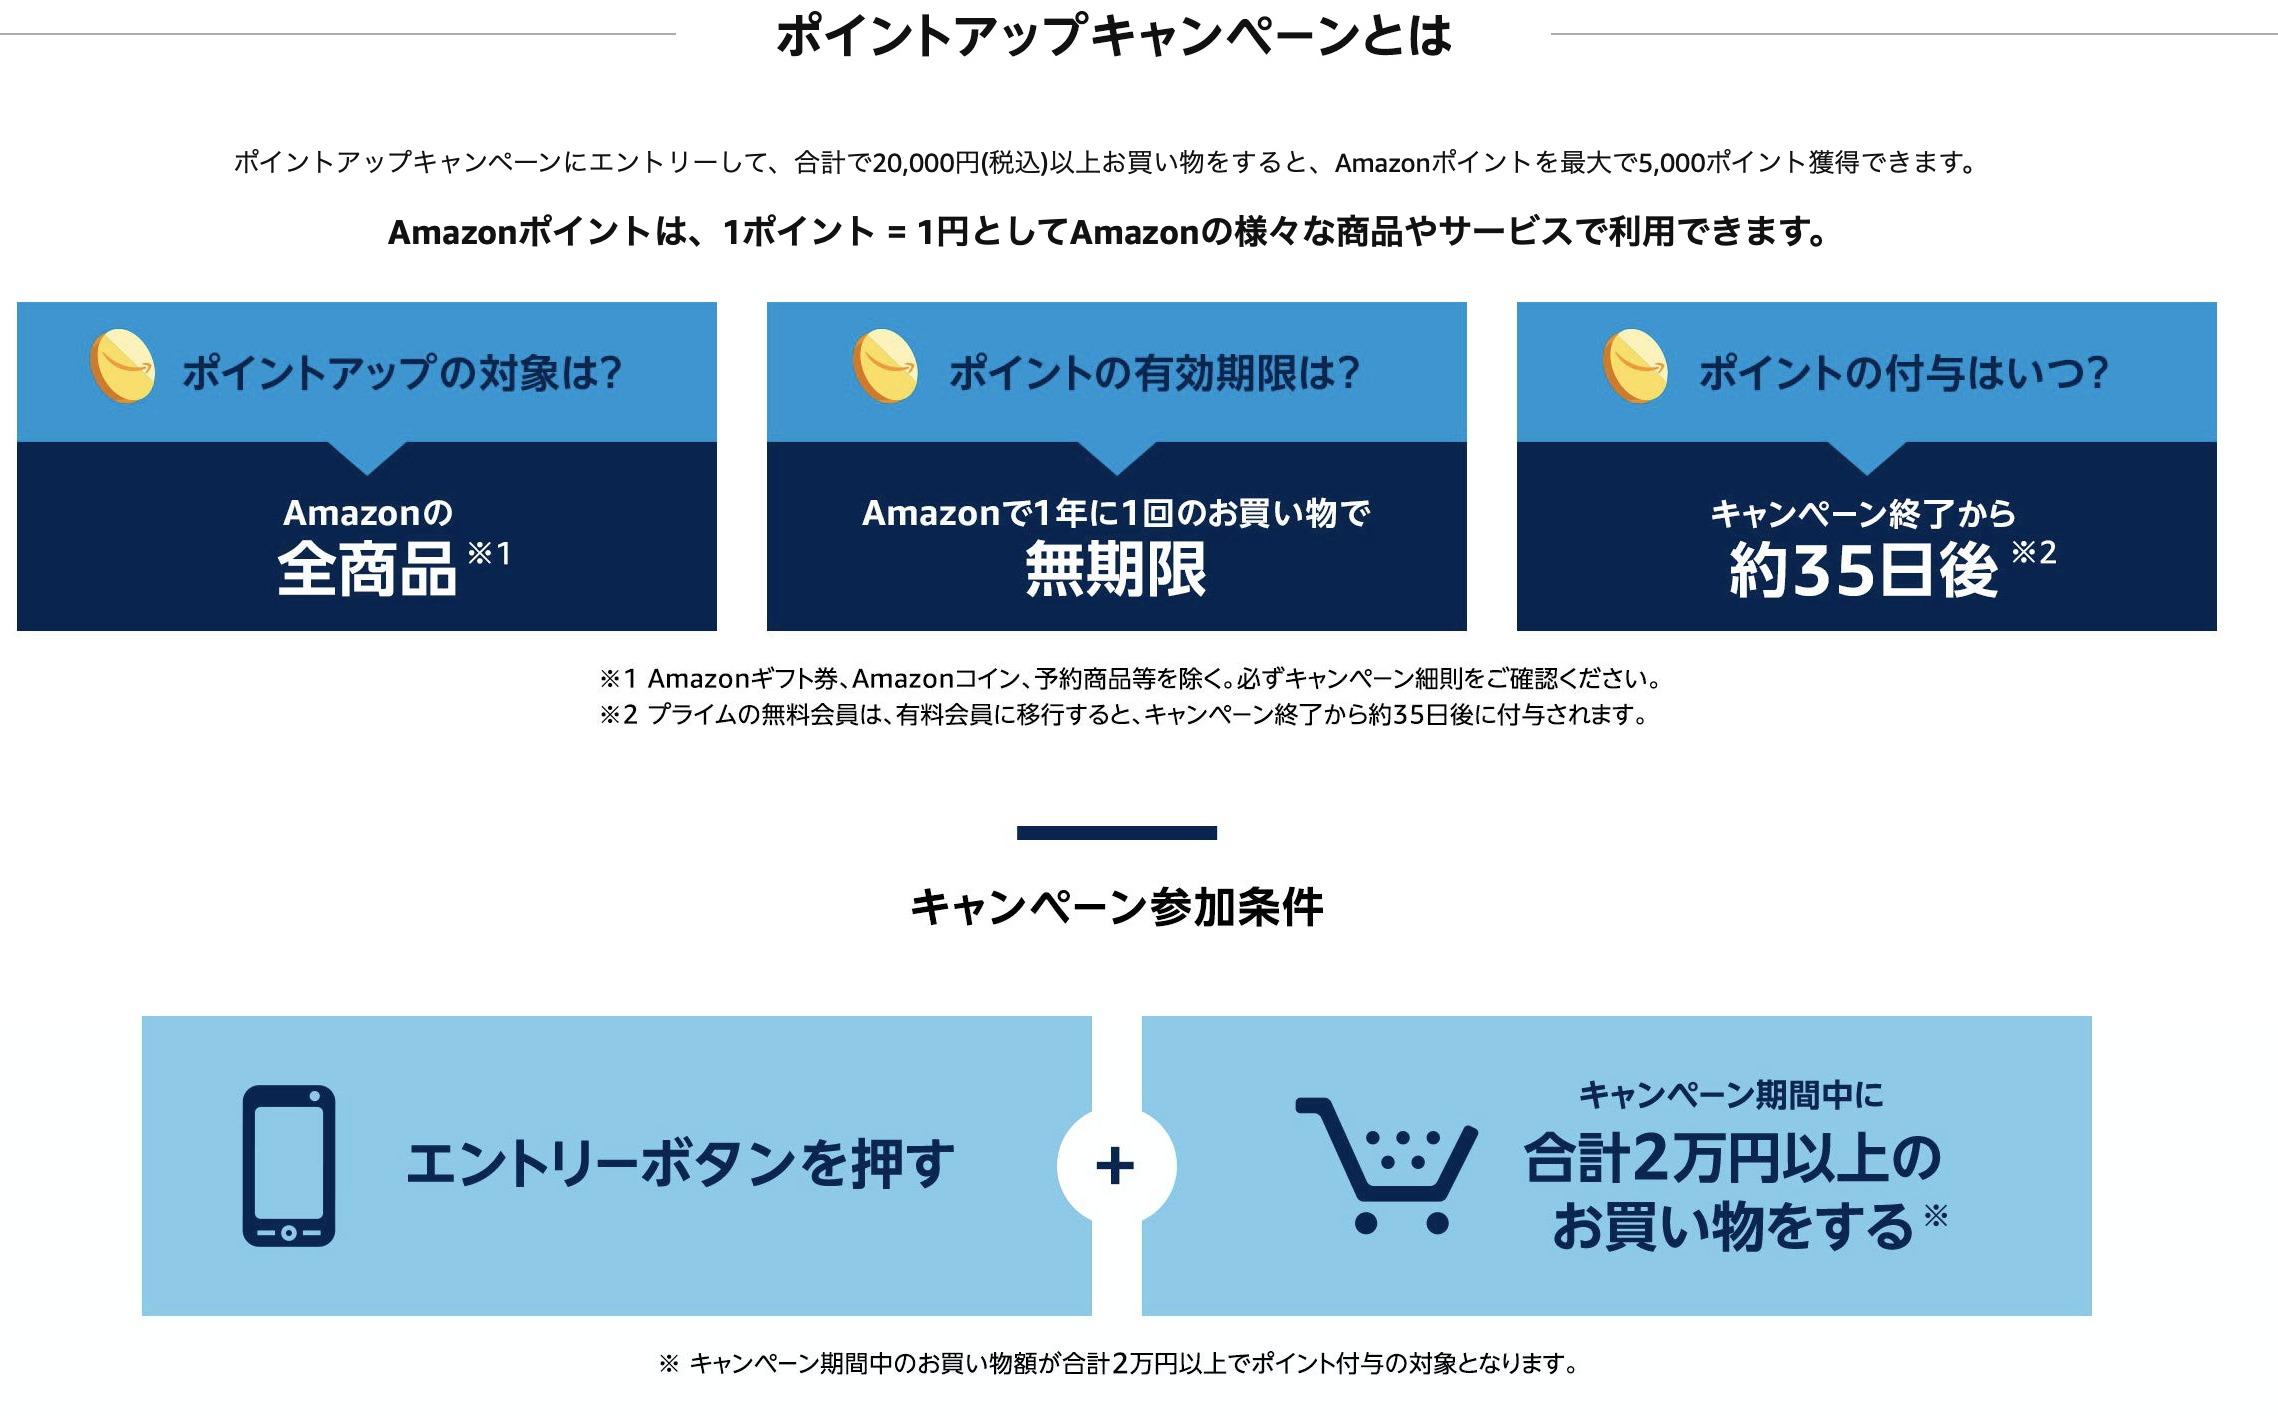 amazonキャンペーン登録方法